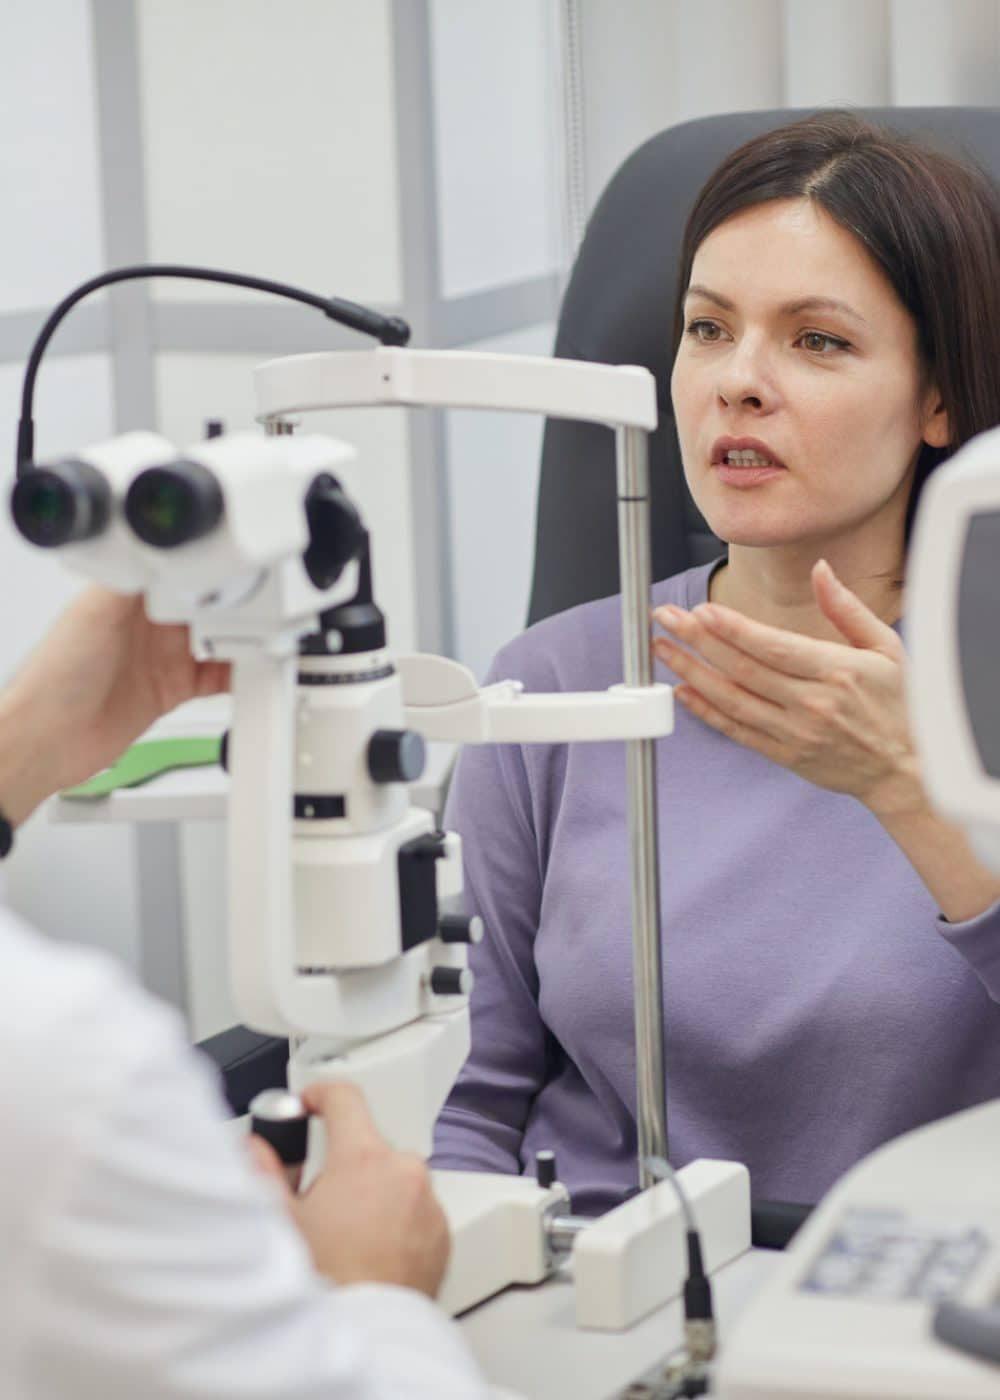 young-woman-visiting-opthalmologist-pcpj53ug0n1u3pkjsmbka9tz7j0d027z0dv57ywer4-pichi@2x